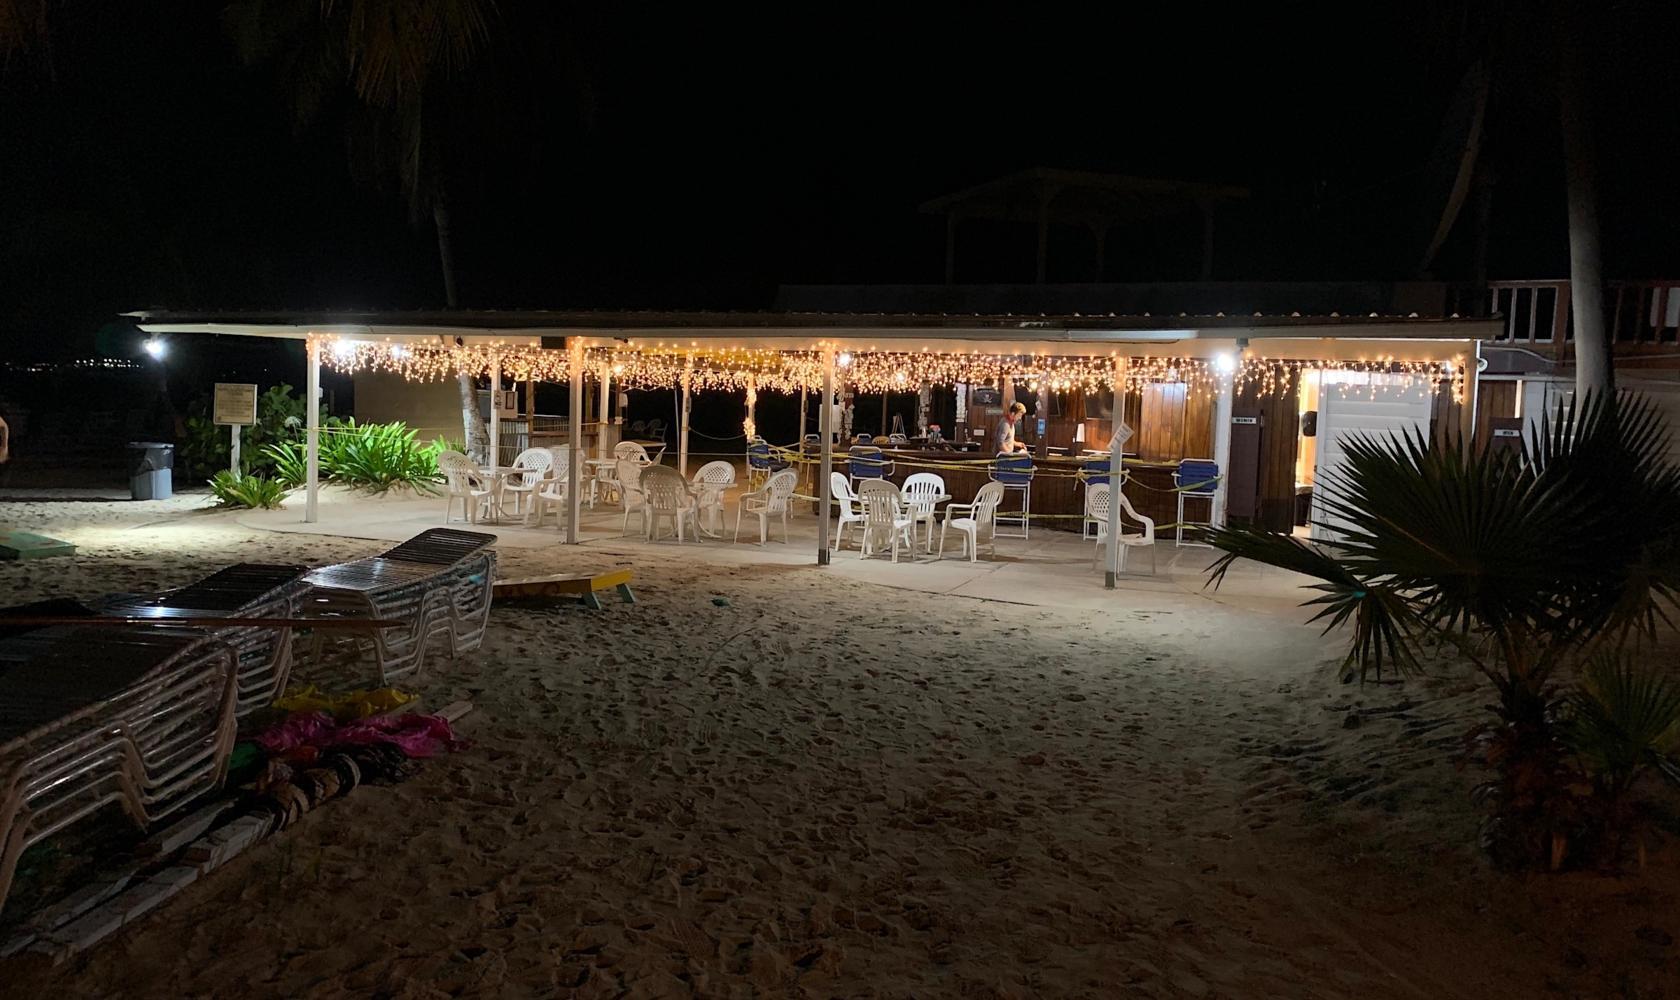 The Beach Bar at night